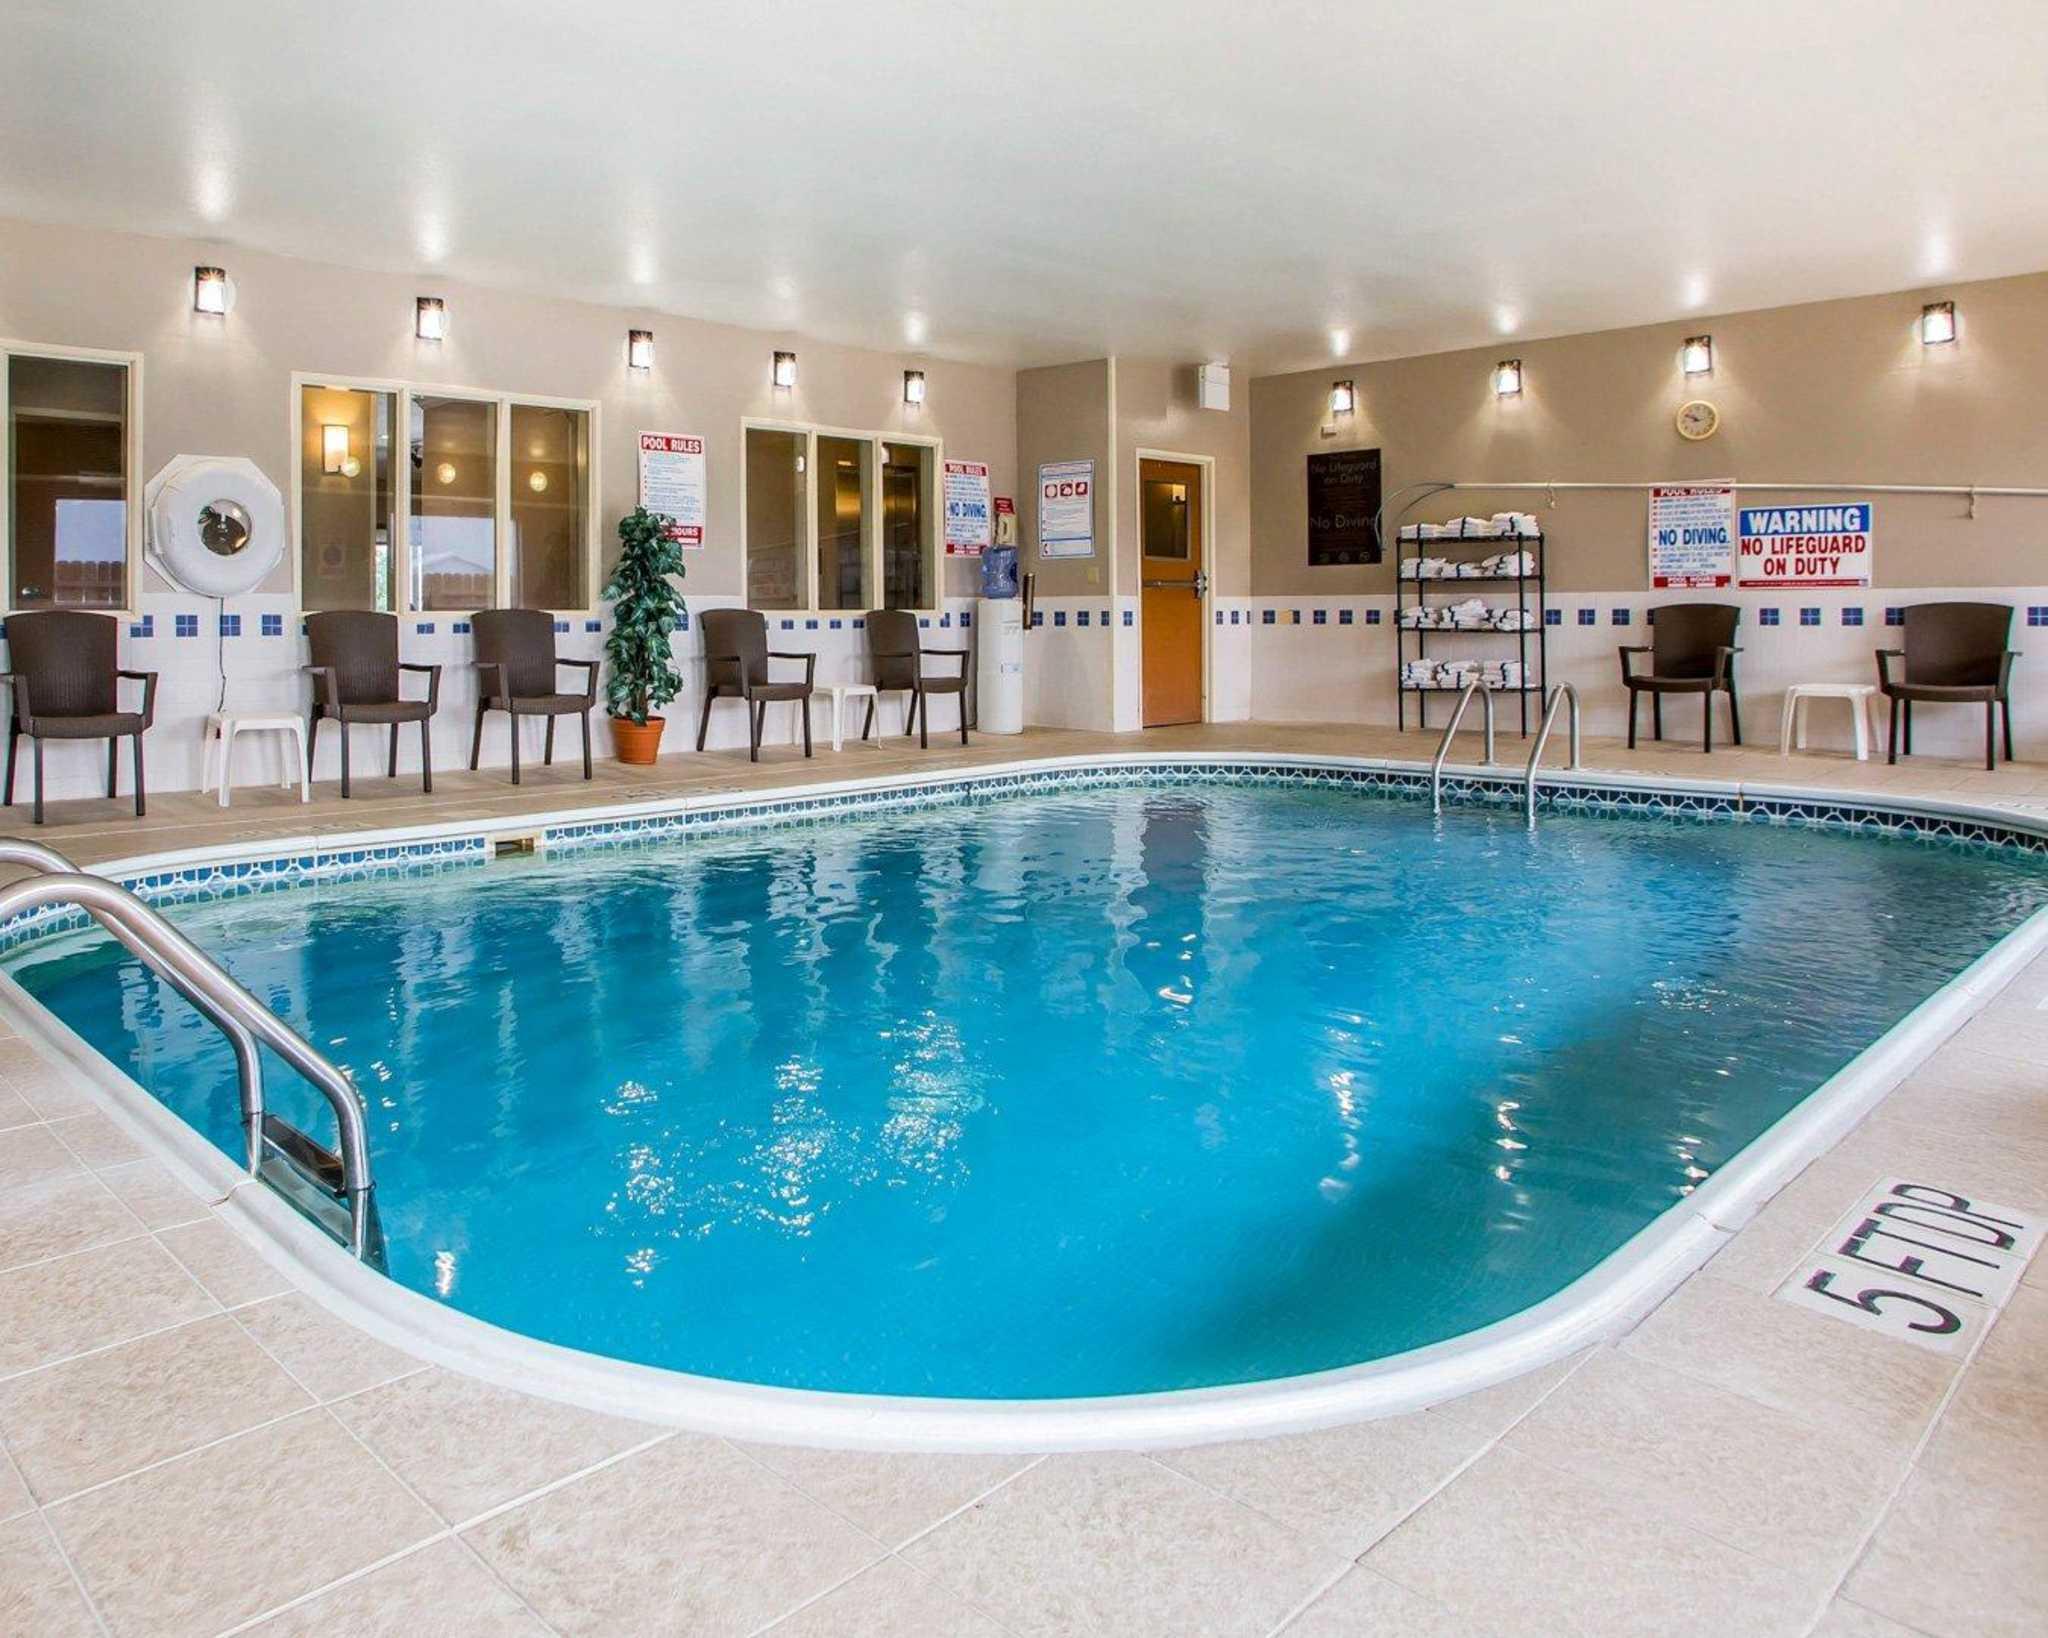 Comfort Inn & Suites Waterloo – Cedar Falls image 13